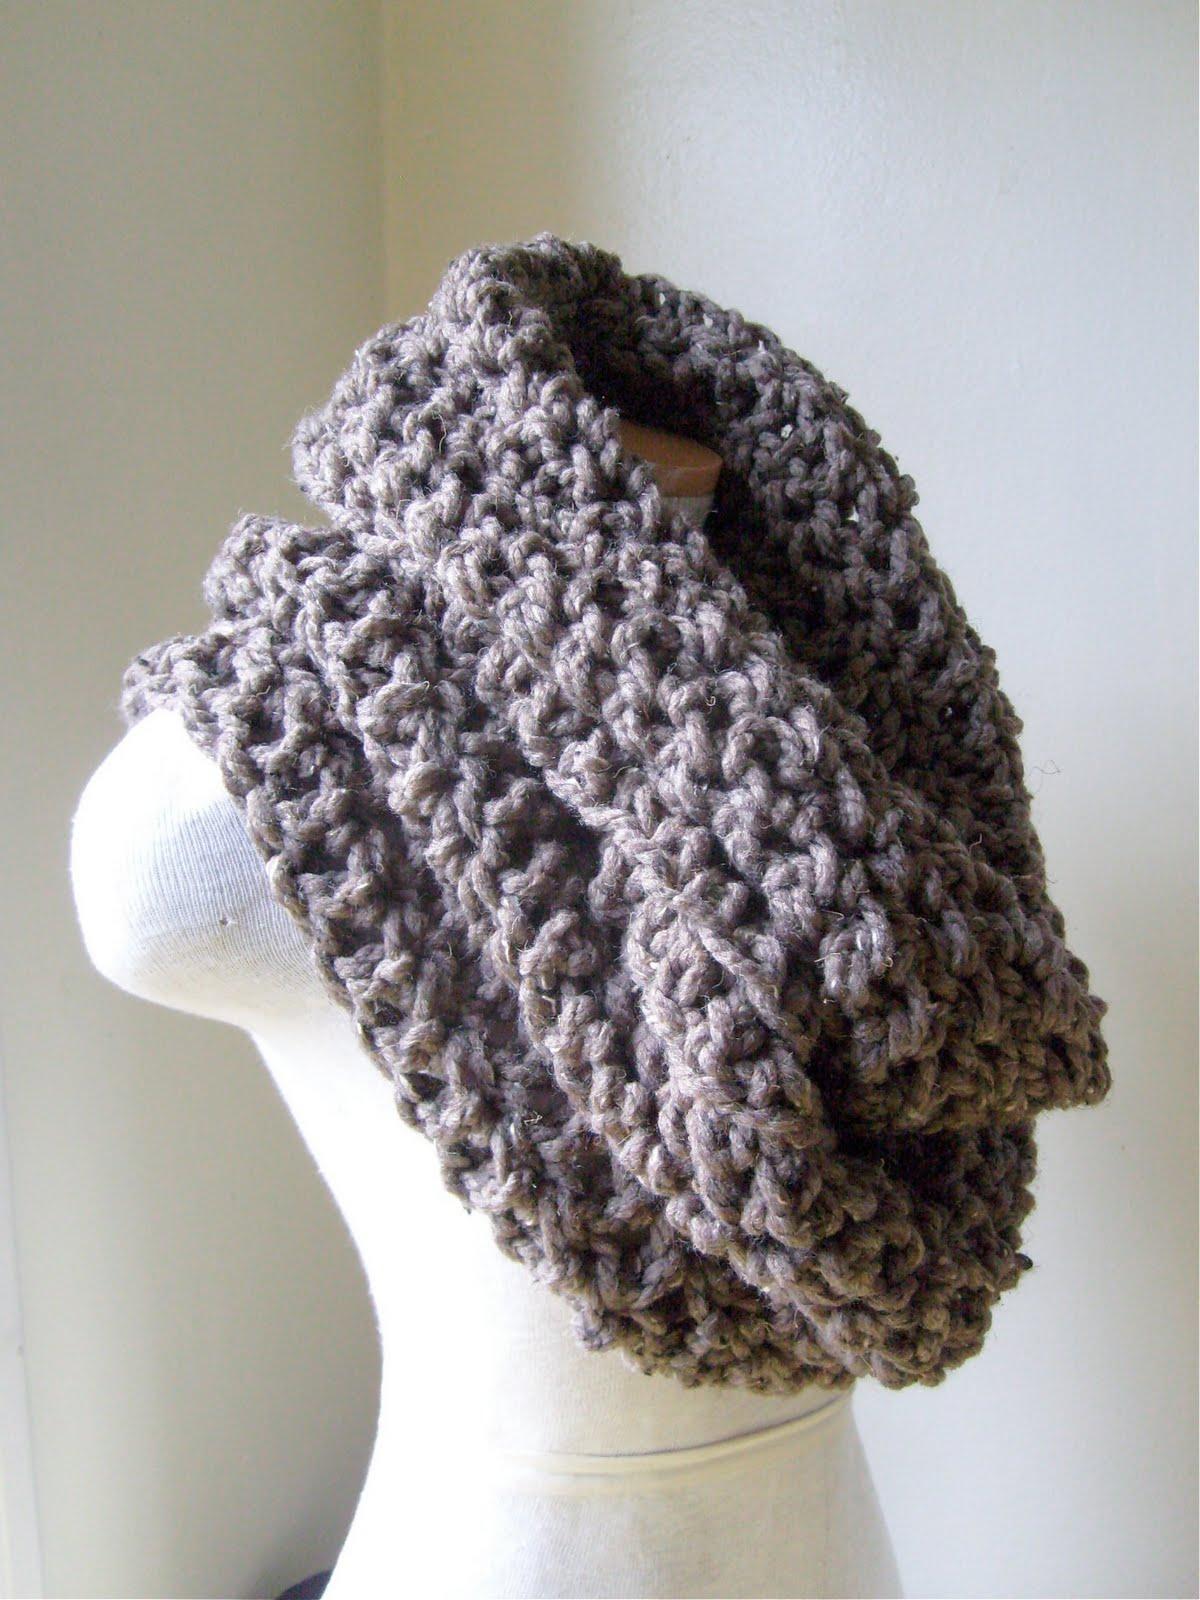 Crochet Cowl : Crocheted Cowl Neckwarmers